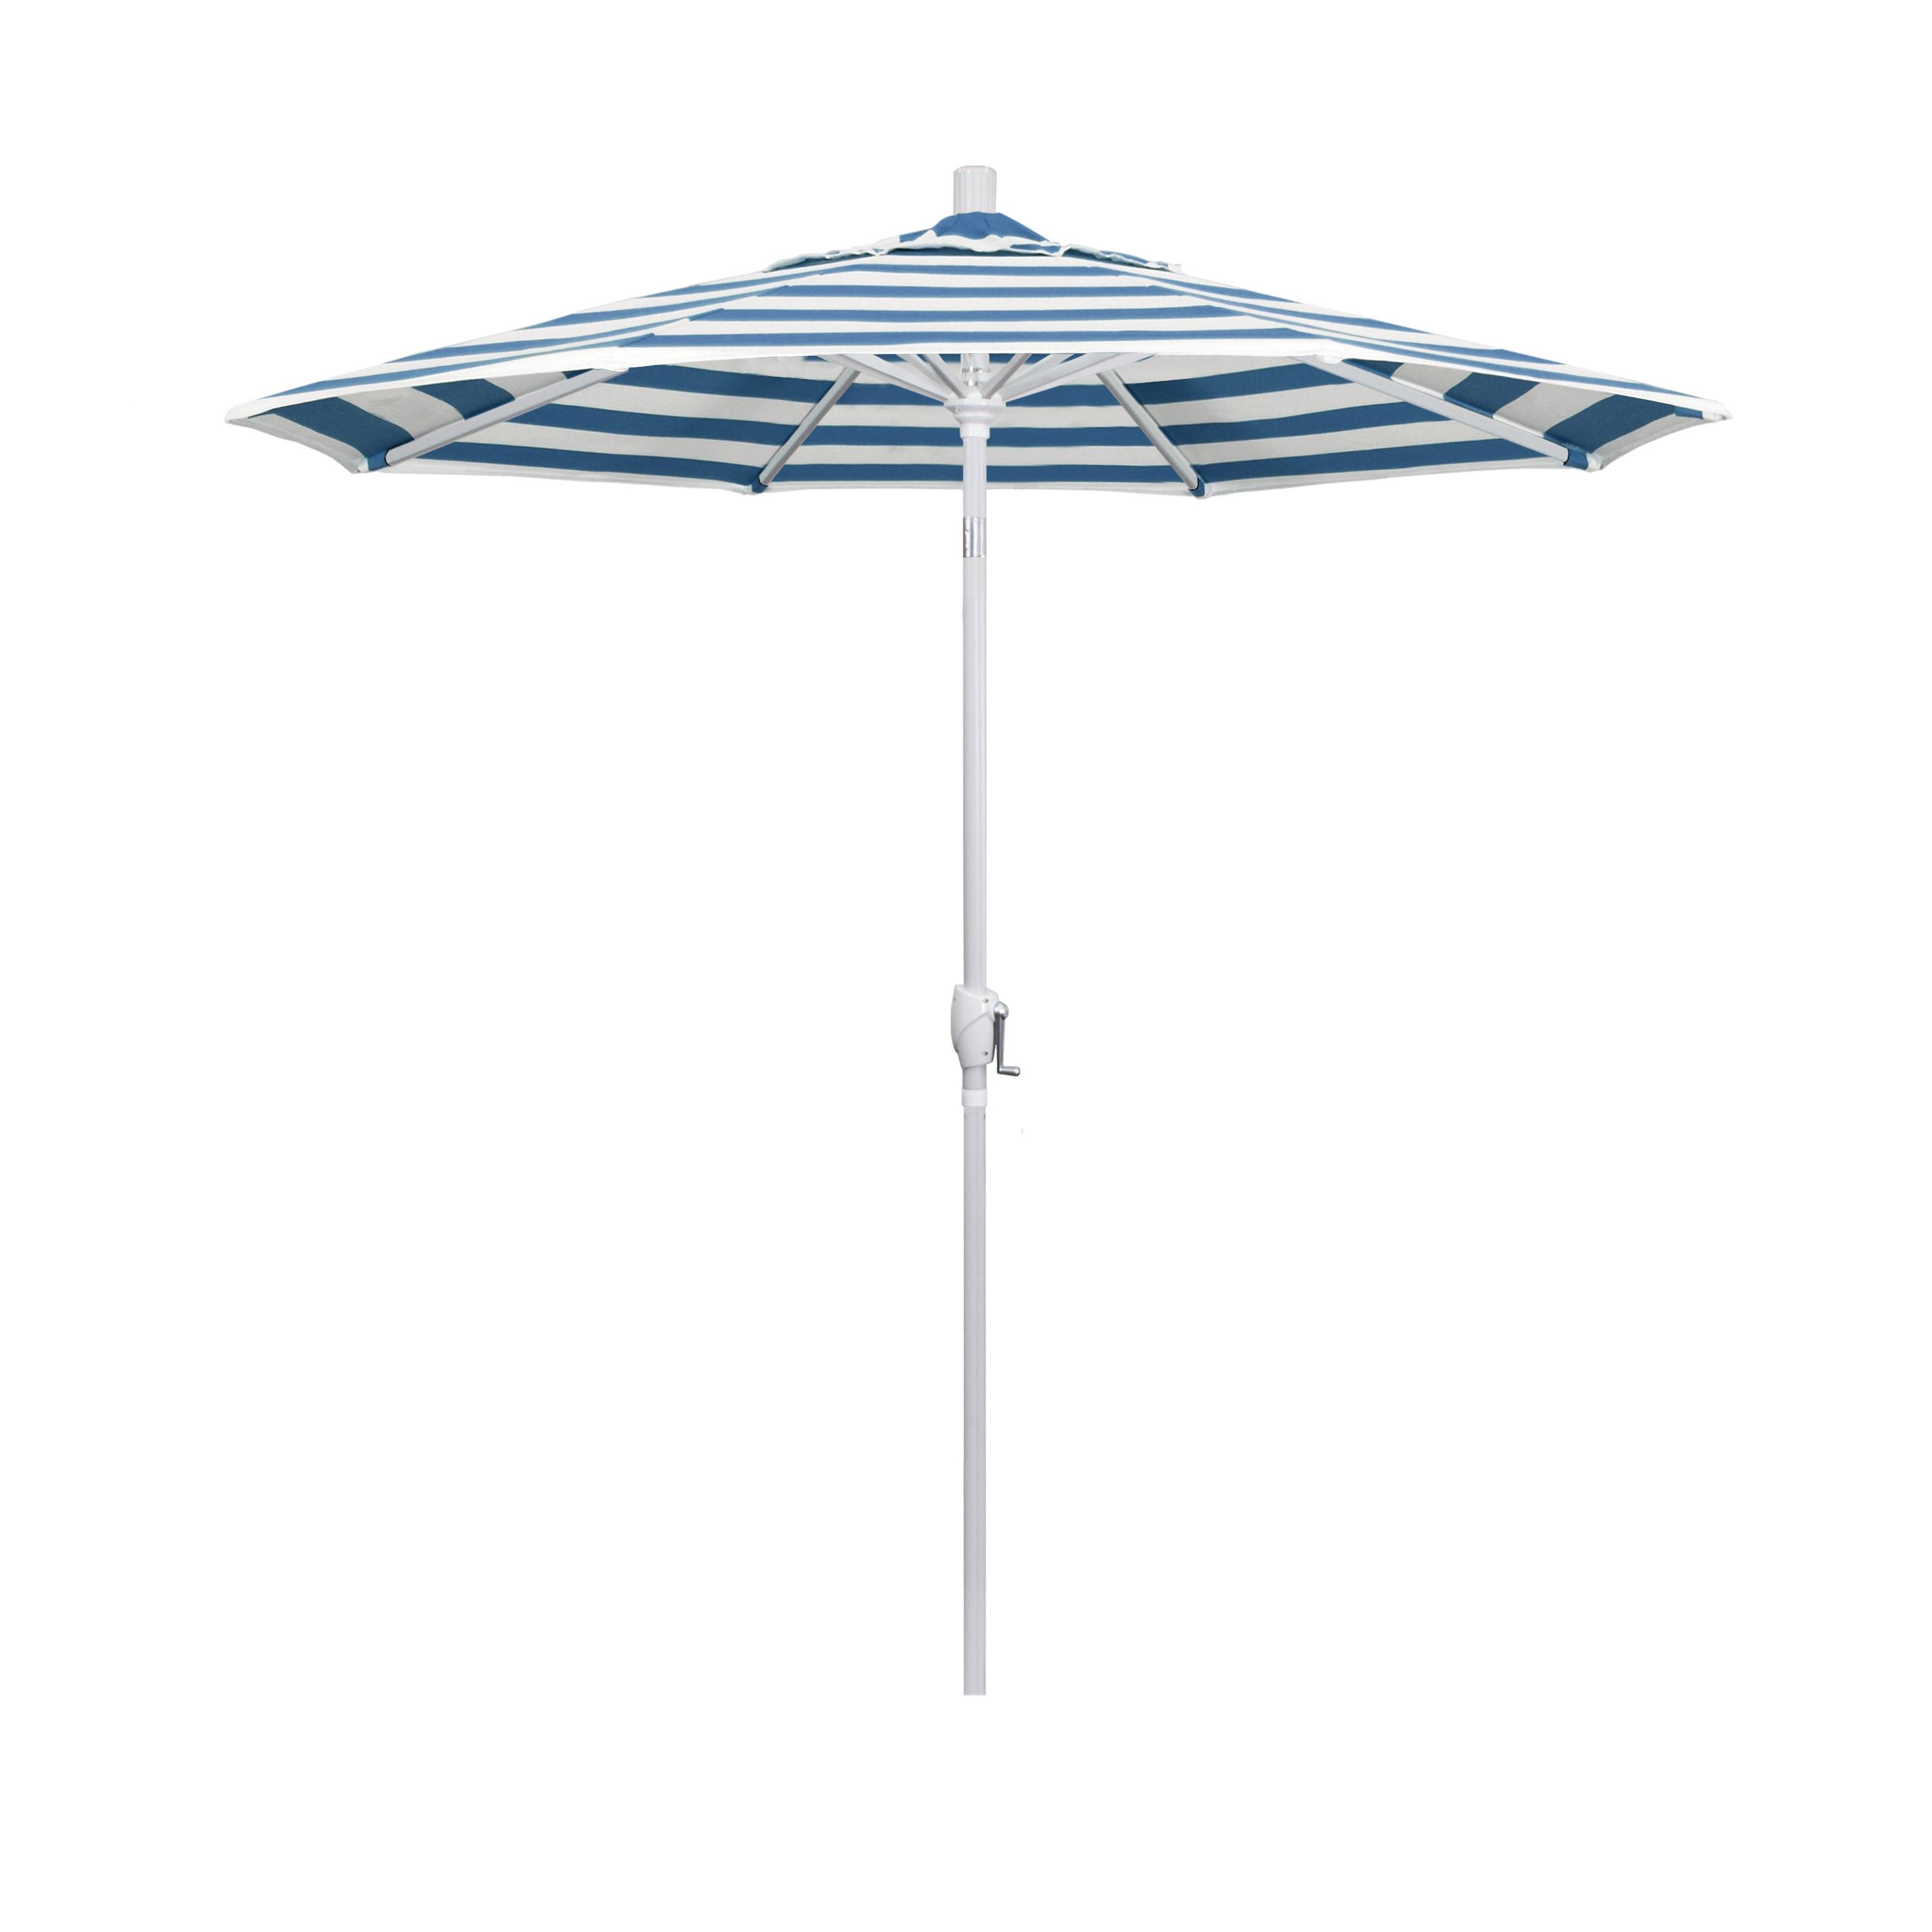 Newest Caravelle Market Sunbrella Umbrellas Pertaining To 7.5' Market Sunbrella Umbrella (Gallery 10 of 20)